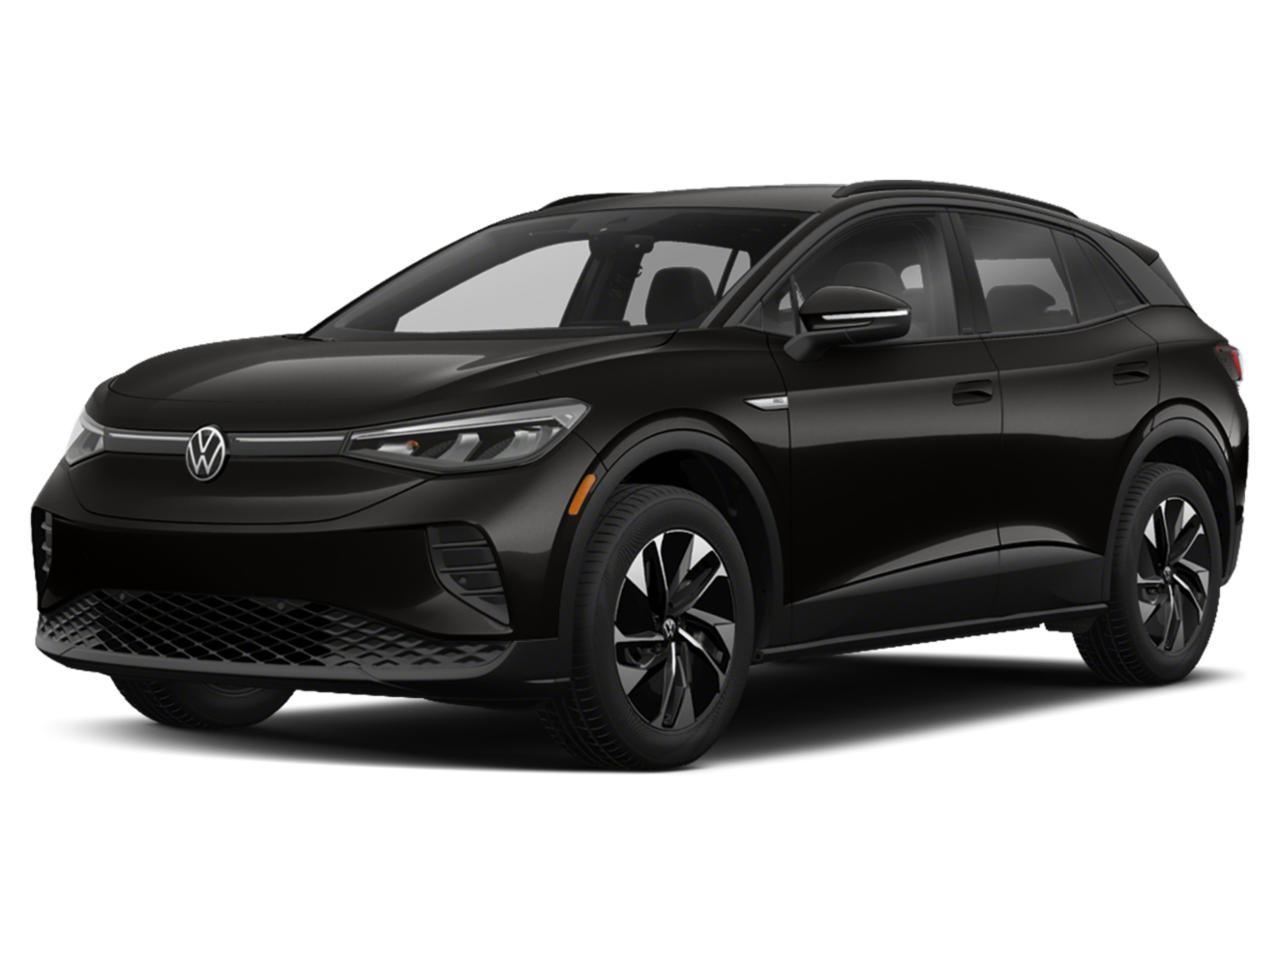 2021 Volkswagen ID.4 Vehicle Photo in San Antonio, TX 78257